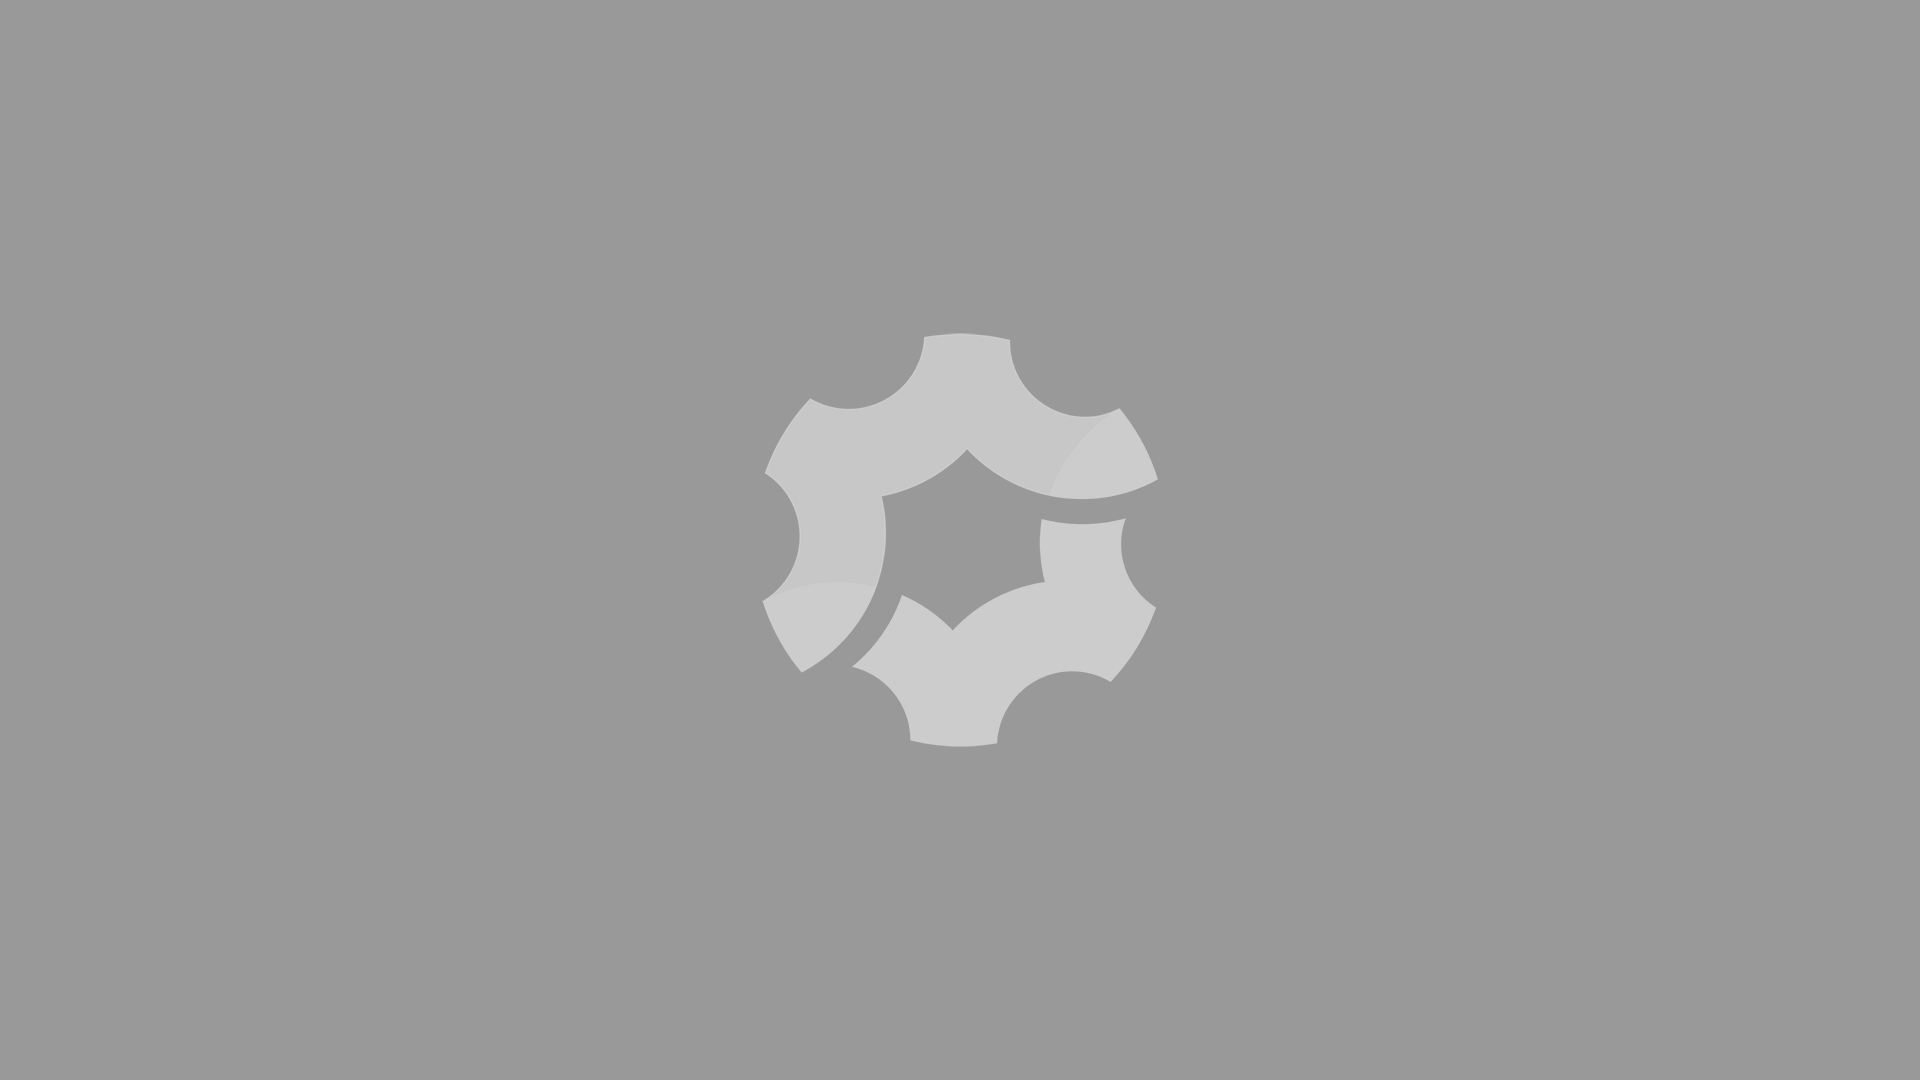 SDK app for Mod Support - mod io